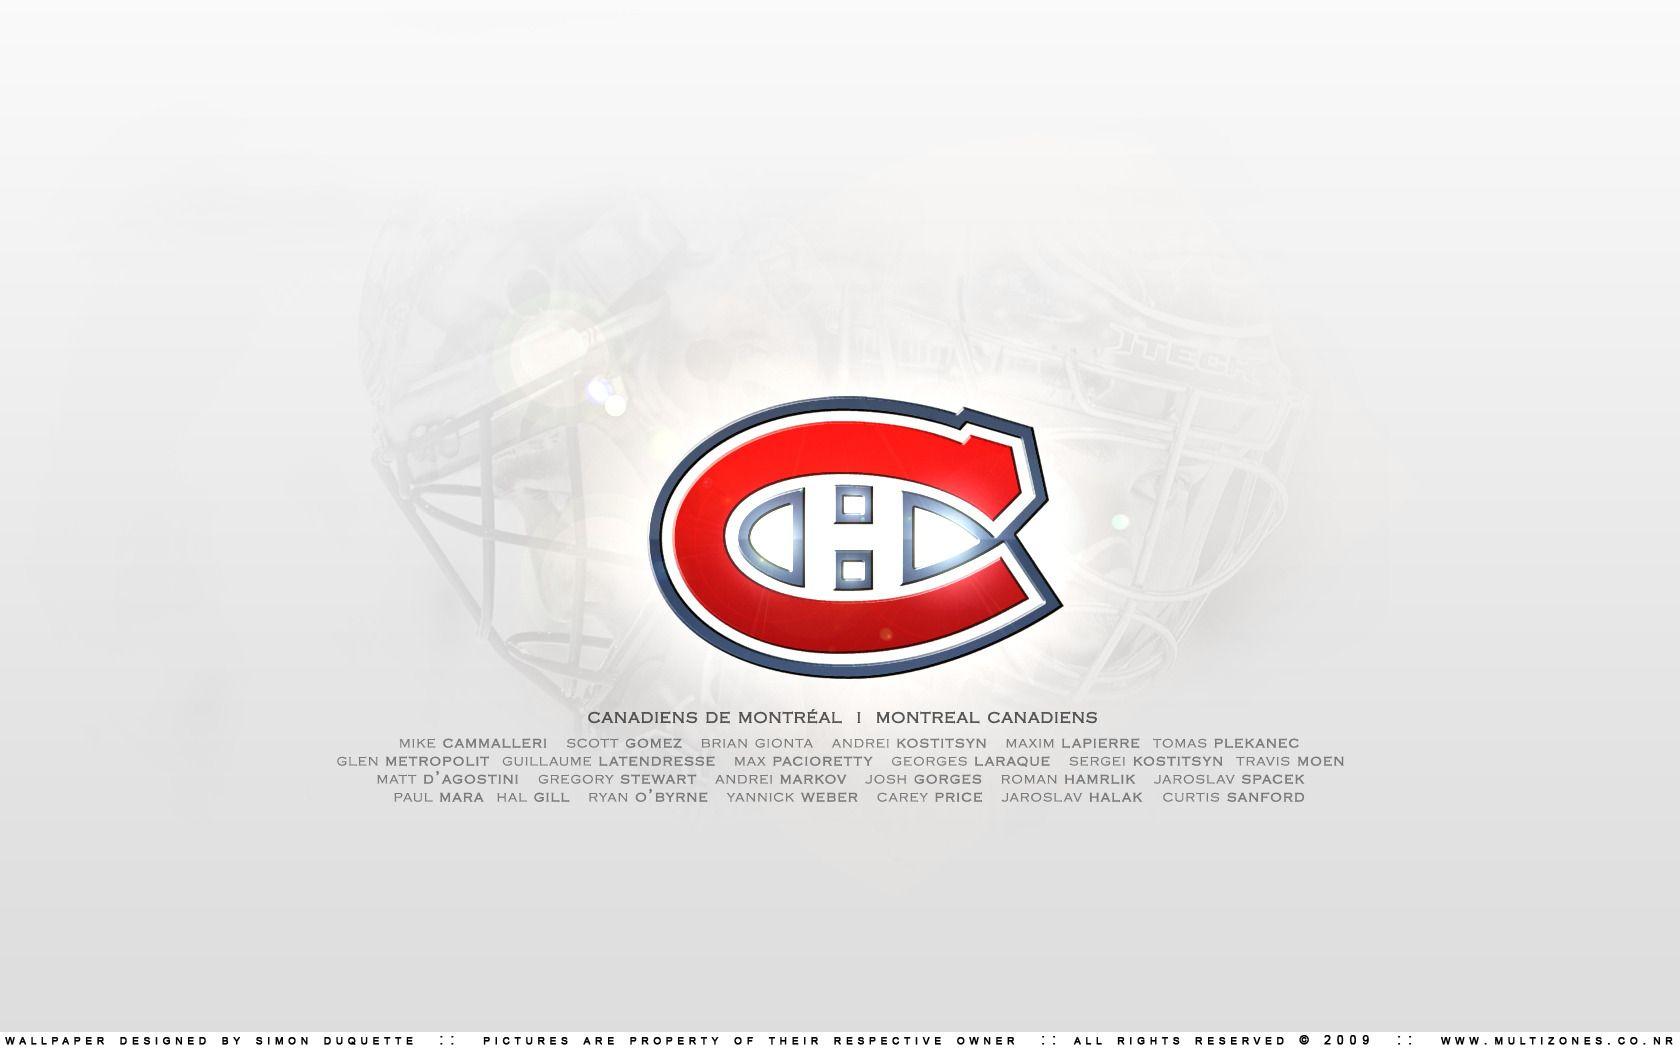 Carey price wallpapers montreal habs montreal hockey 9 html code - Canadiens Wallpapers 2015 Wallpaper Cave Canadiens Wallpapers 2015 Wallpaper Cave 0 Html Code Wallpapers Montreal Habs Montreal Hockey